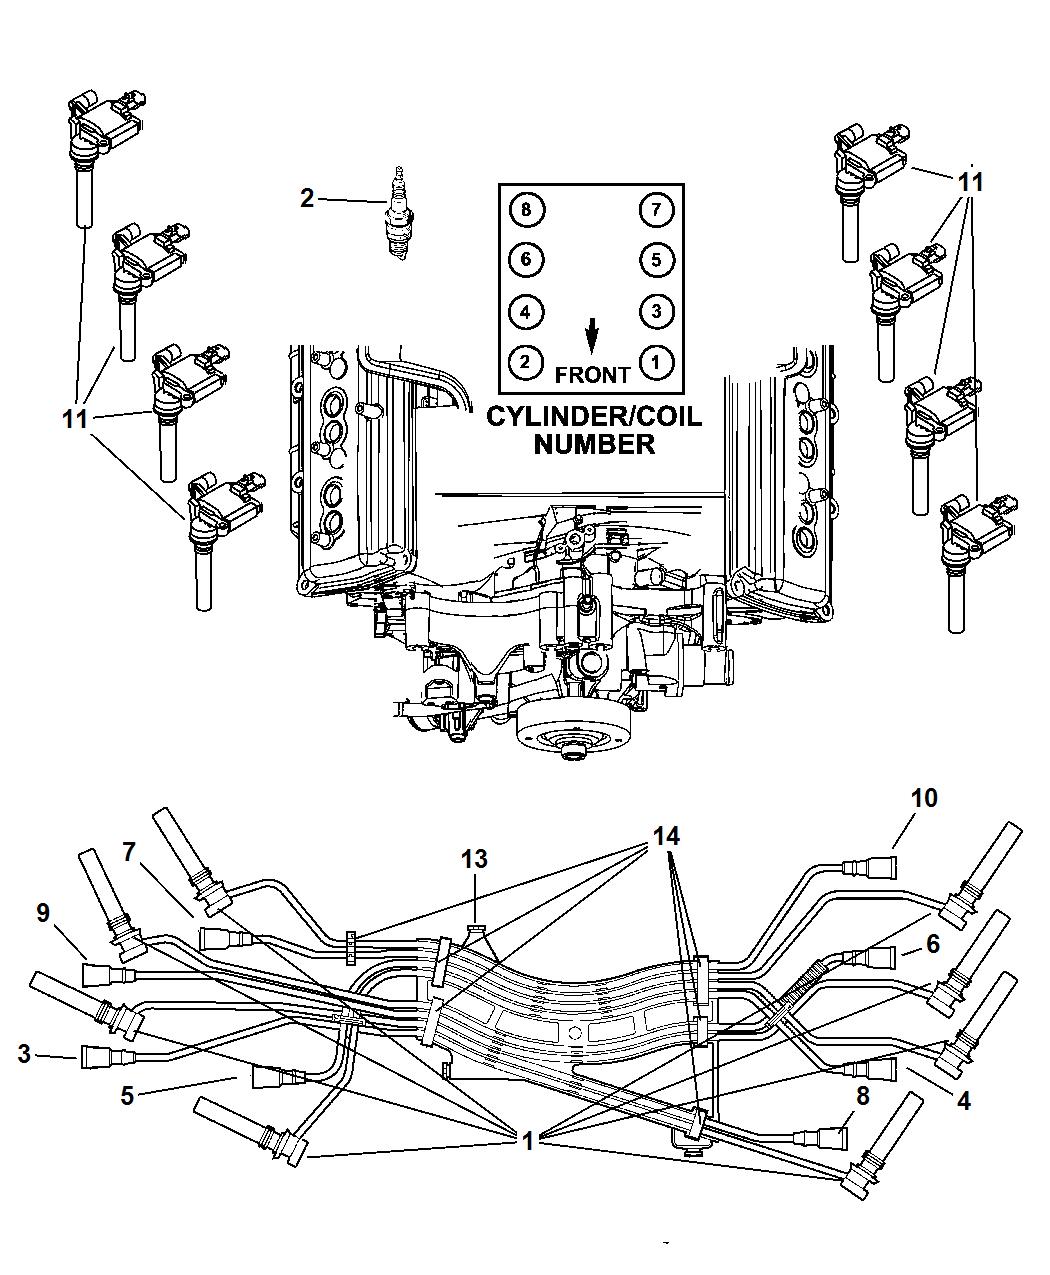 XN_9072] Ram 5 7 Hemi Engine On 2004 Dodge 5 7 Hemi Spark Plug Wiring  Diagram Download DiagramFeren Jebrp Ariot Pap Mohammedshrine Librar Wiring 101